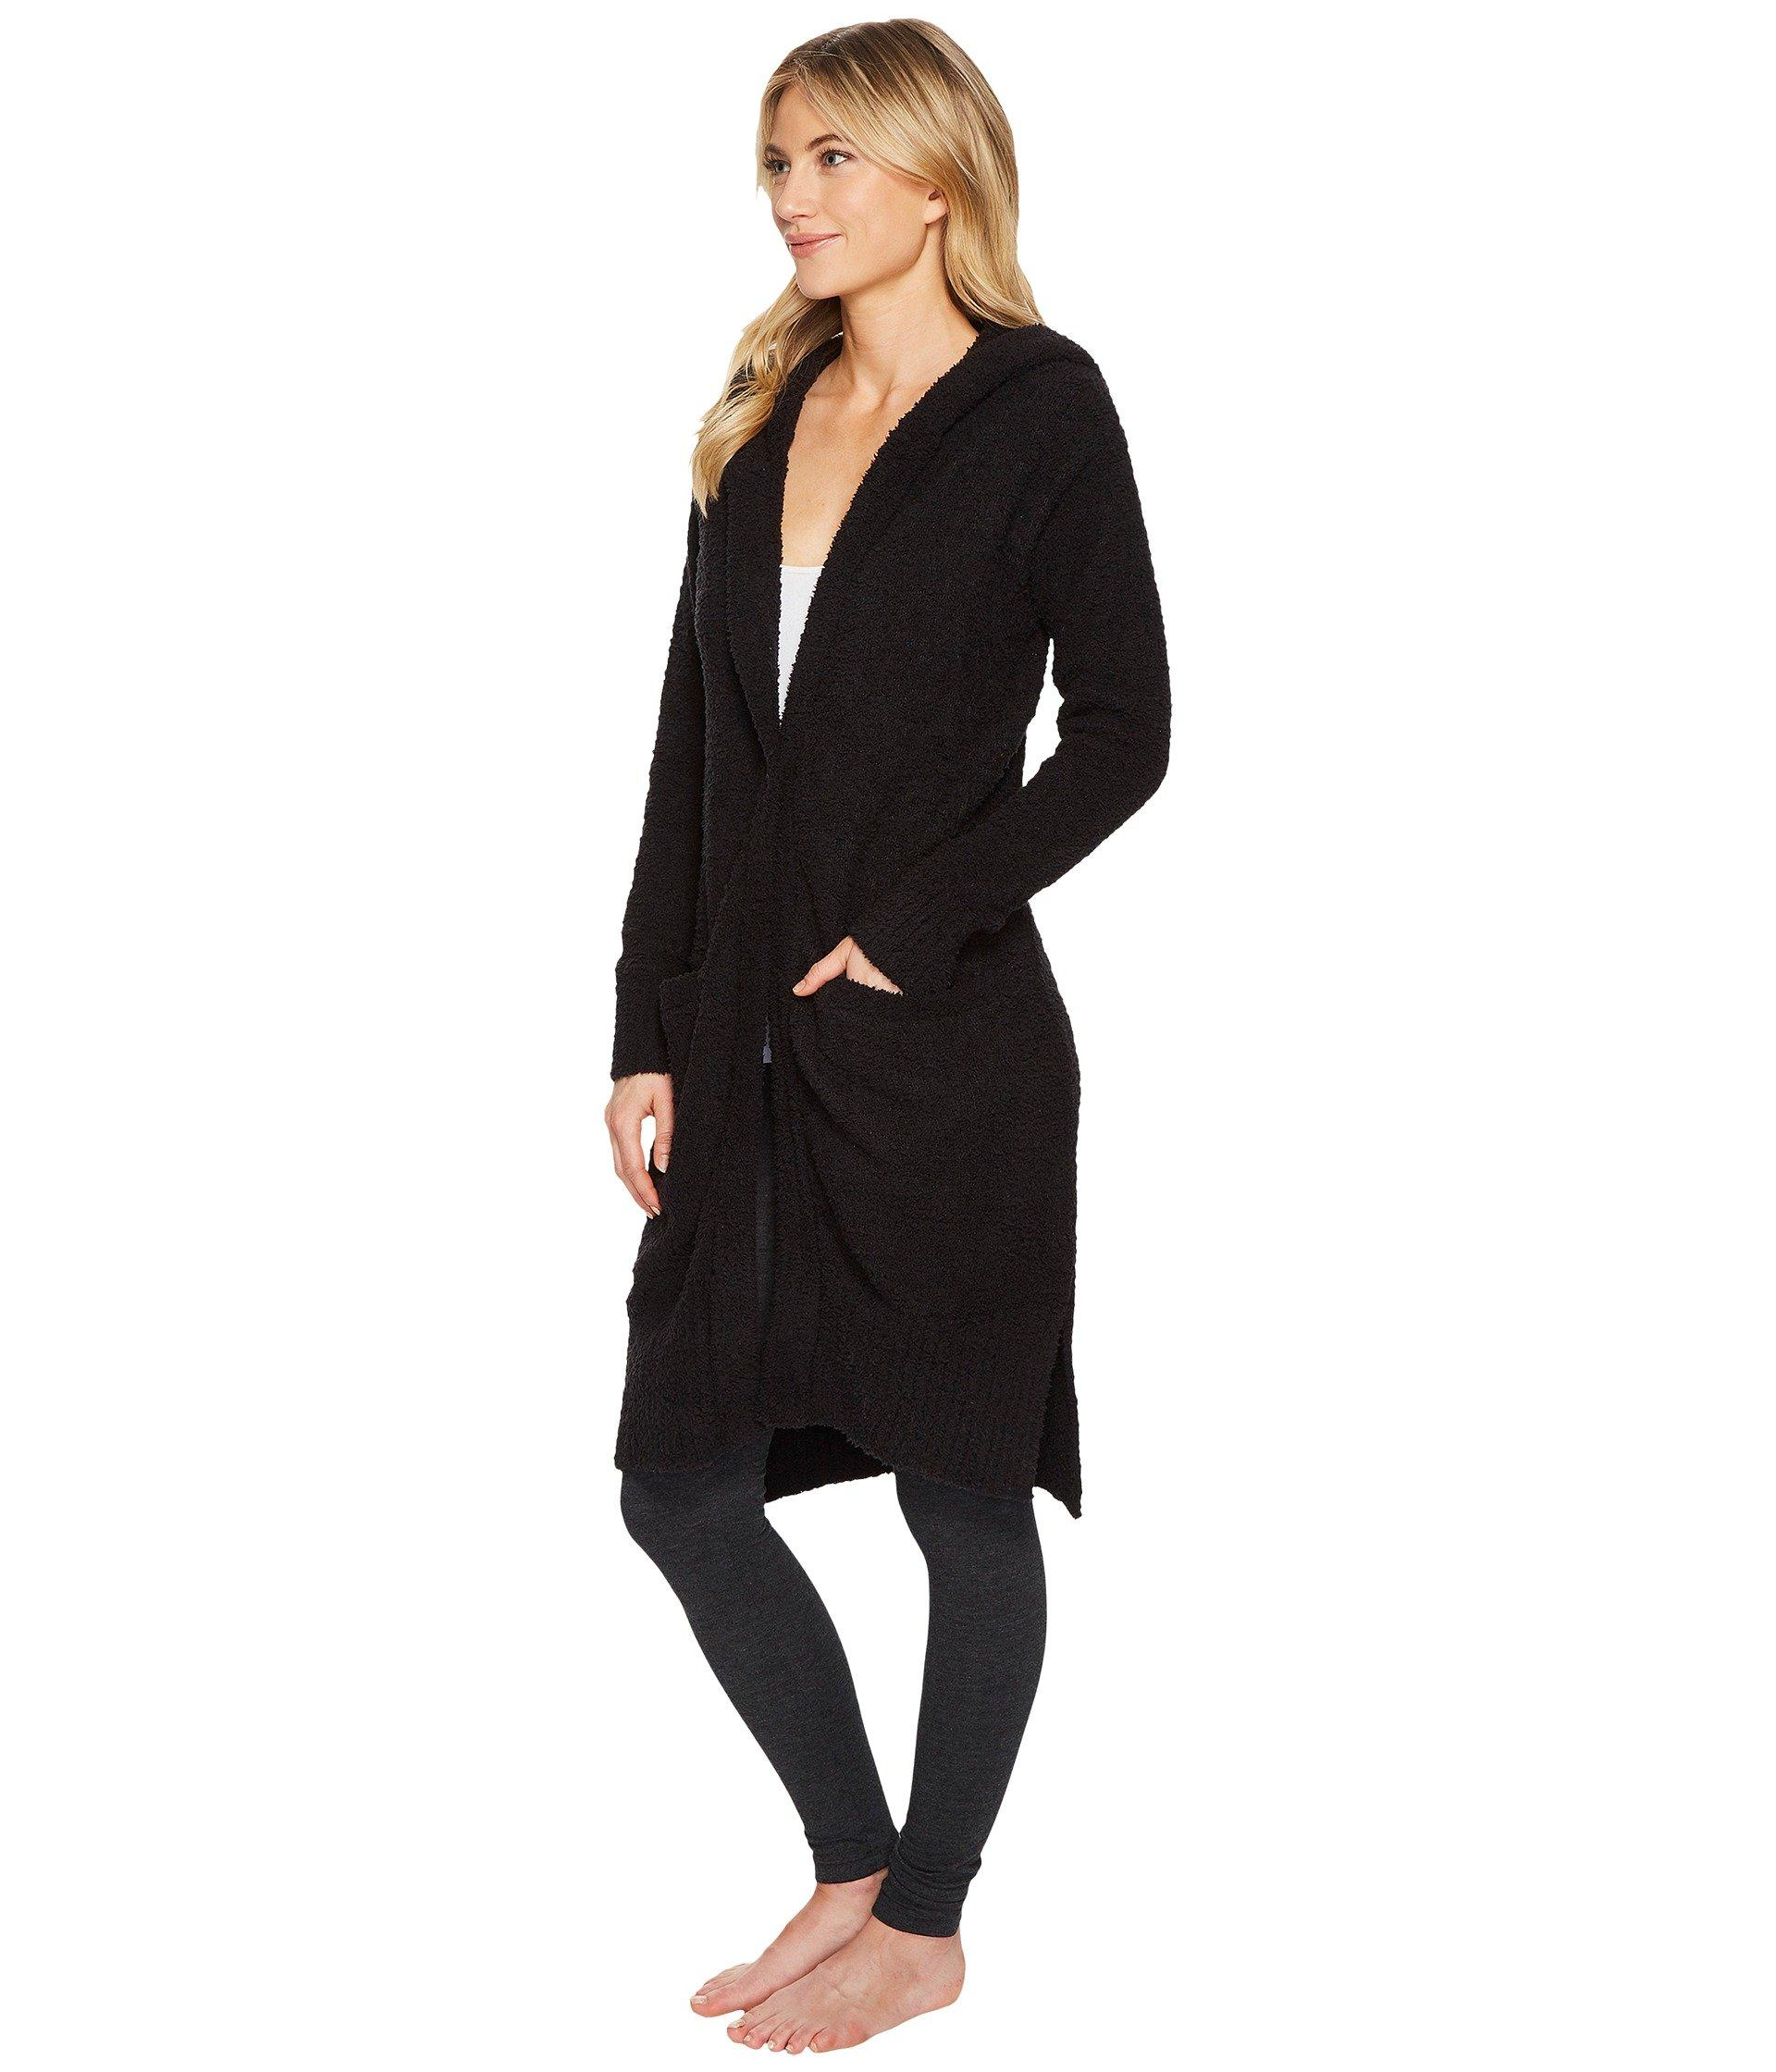 c6e4df2f732 Judith Hooded Cardigan (black 1) Women's Sweater